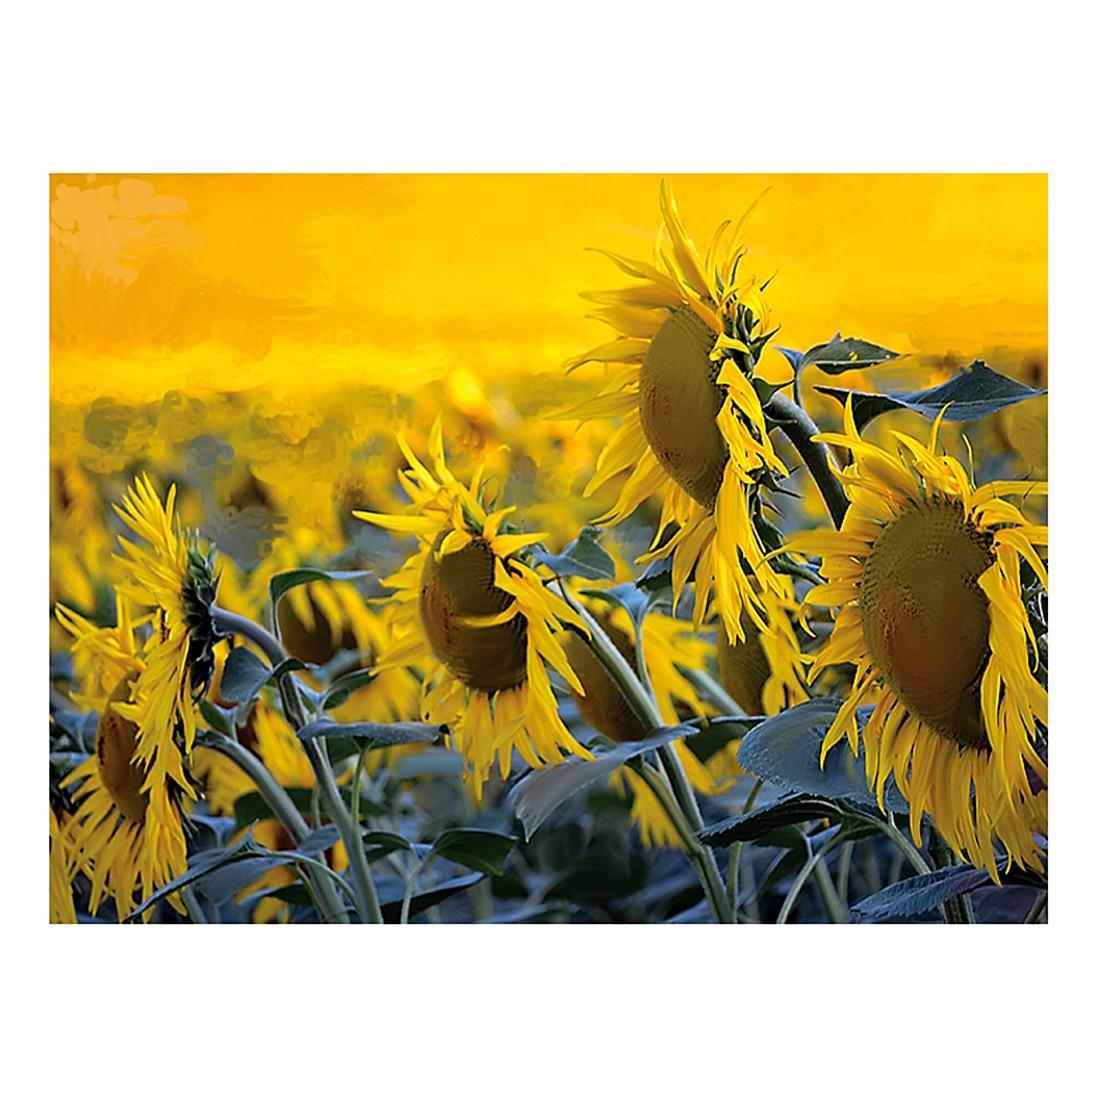 Ölgemälde Infinity Yellow – Größe 40 x 60 cm, yourPainting bestellen